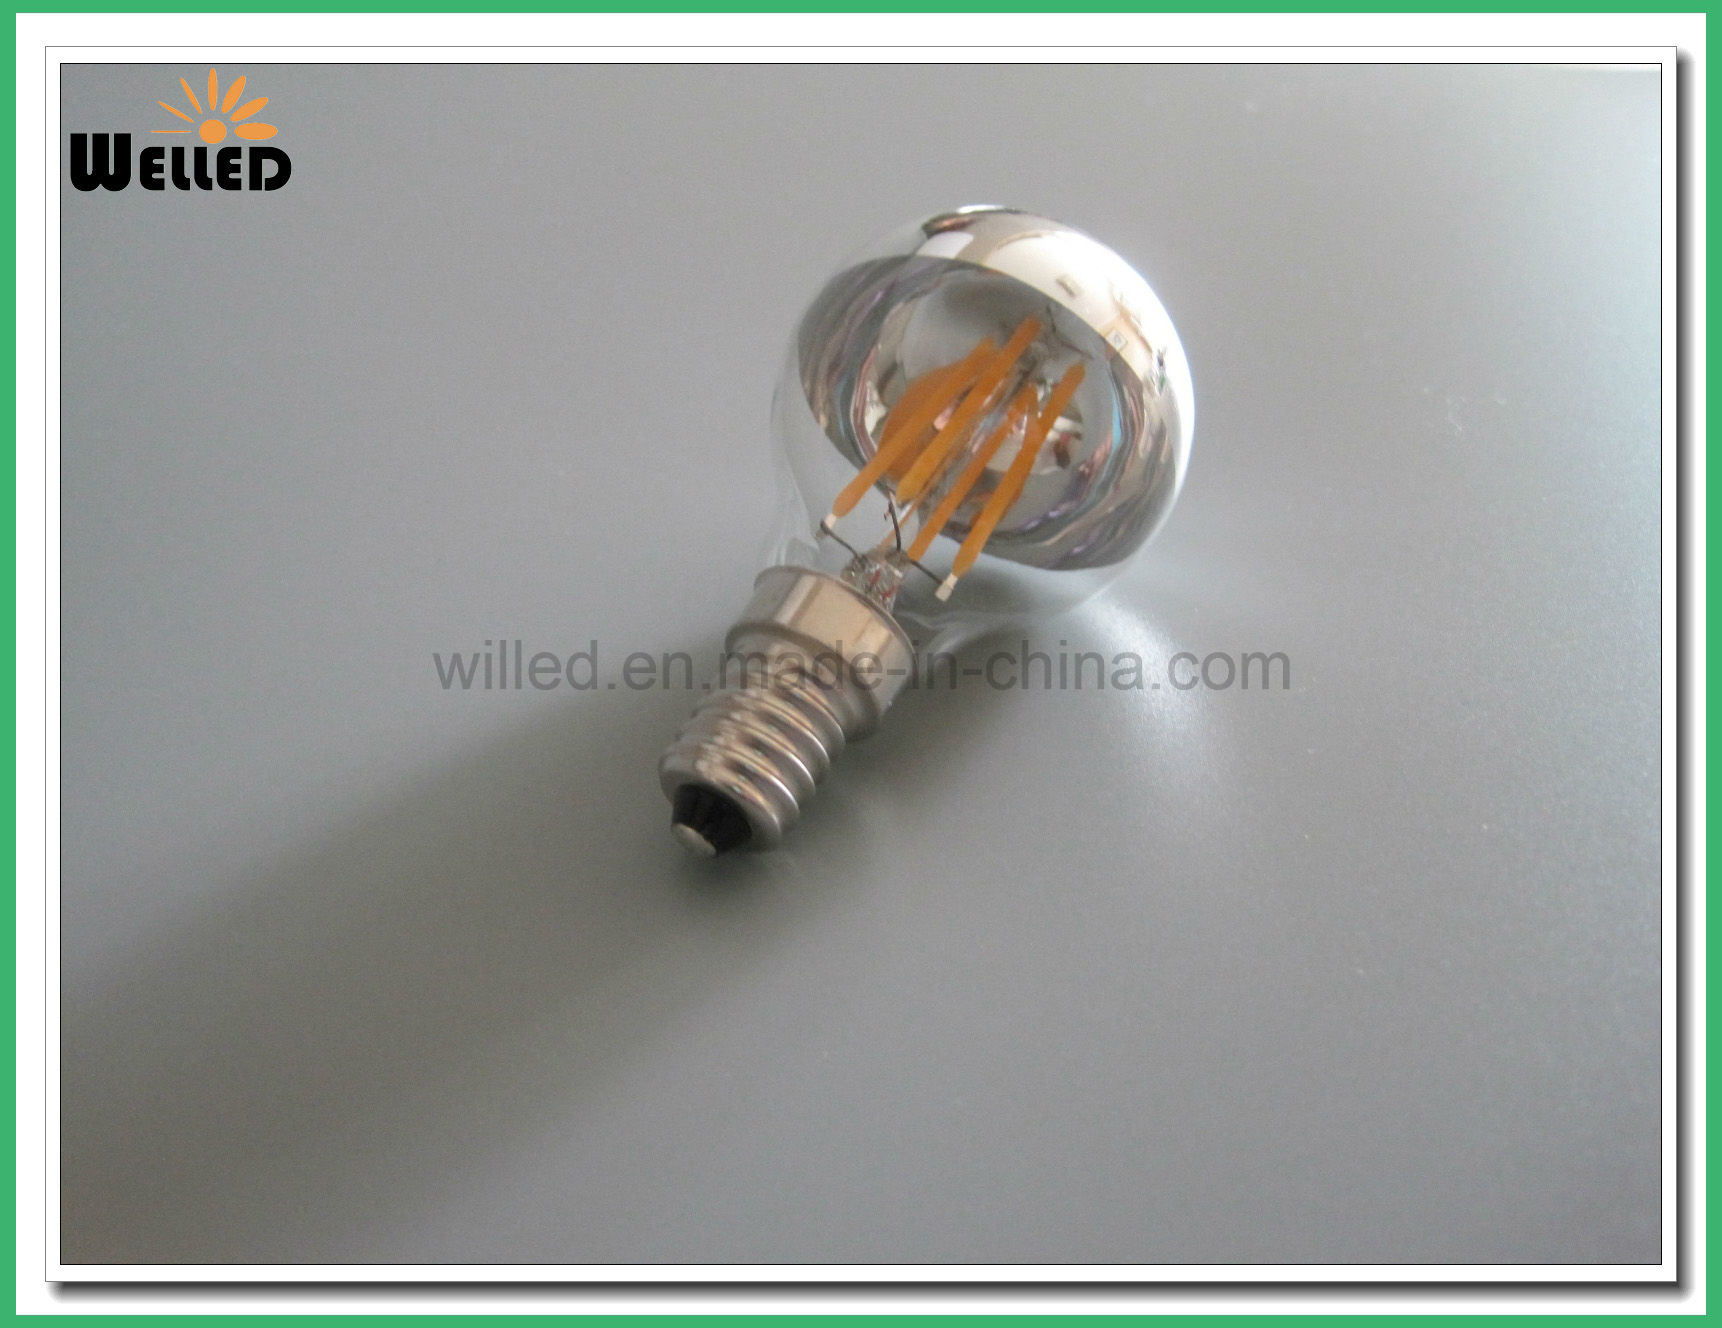 Mirror A60 E27 LED Filament Bulb Light 4W 6W 8W Dimmable 220V 110V